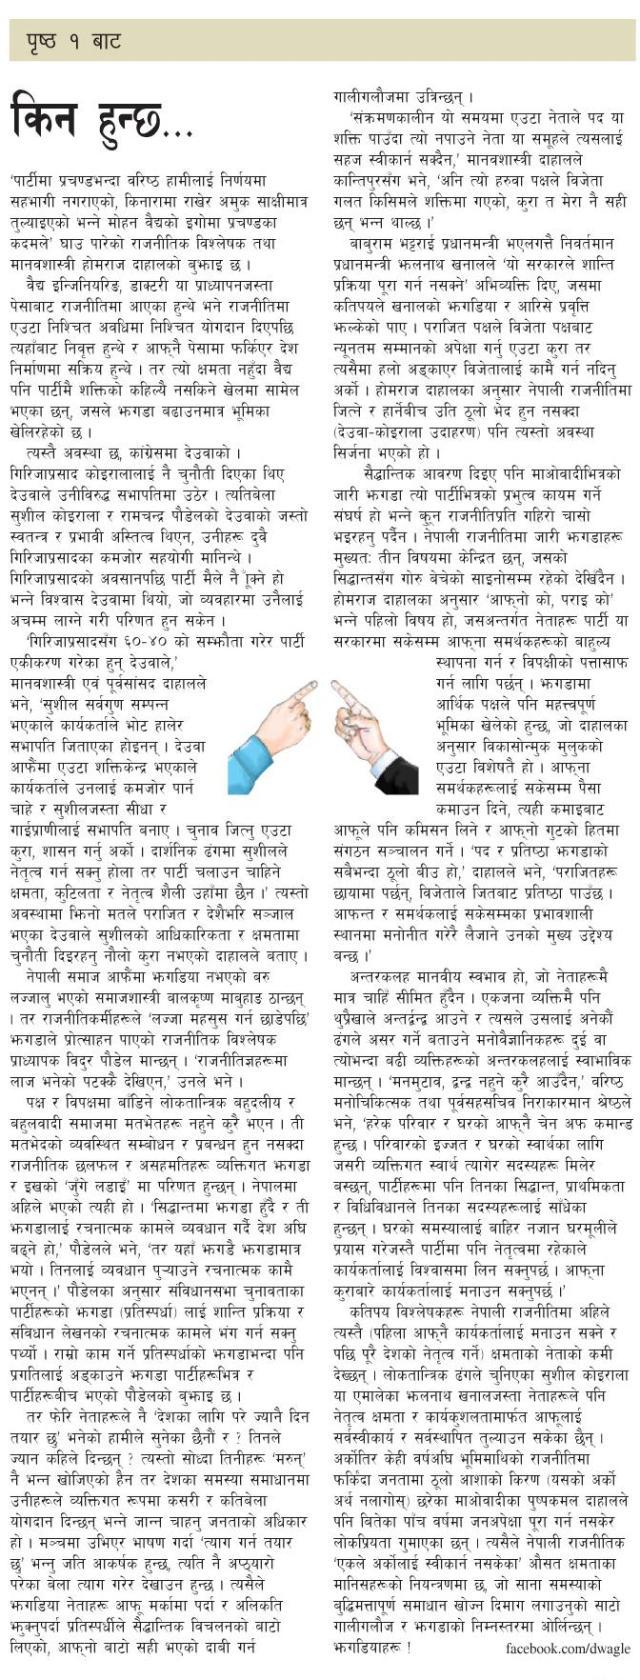 why do politicians quarrel page 2 of 2